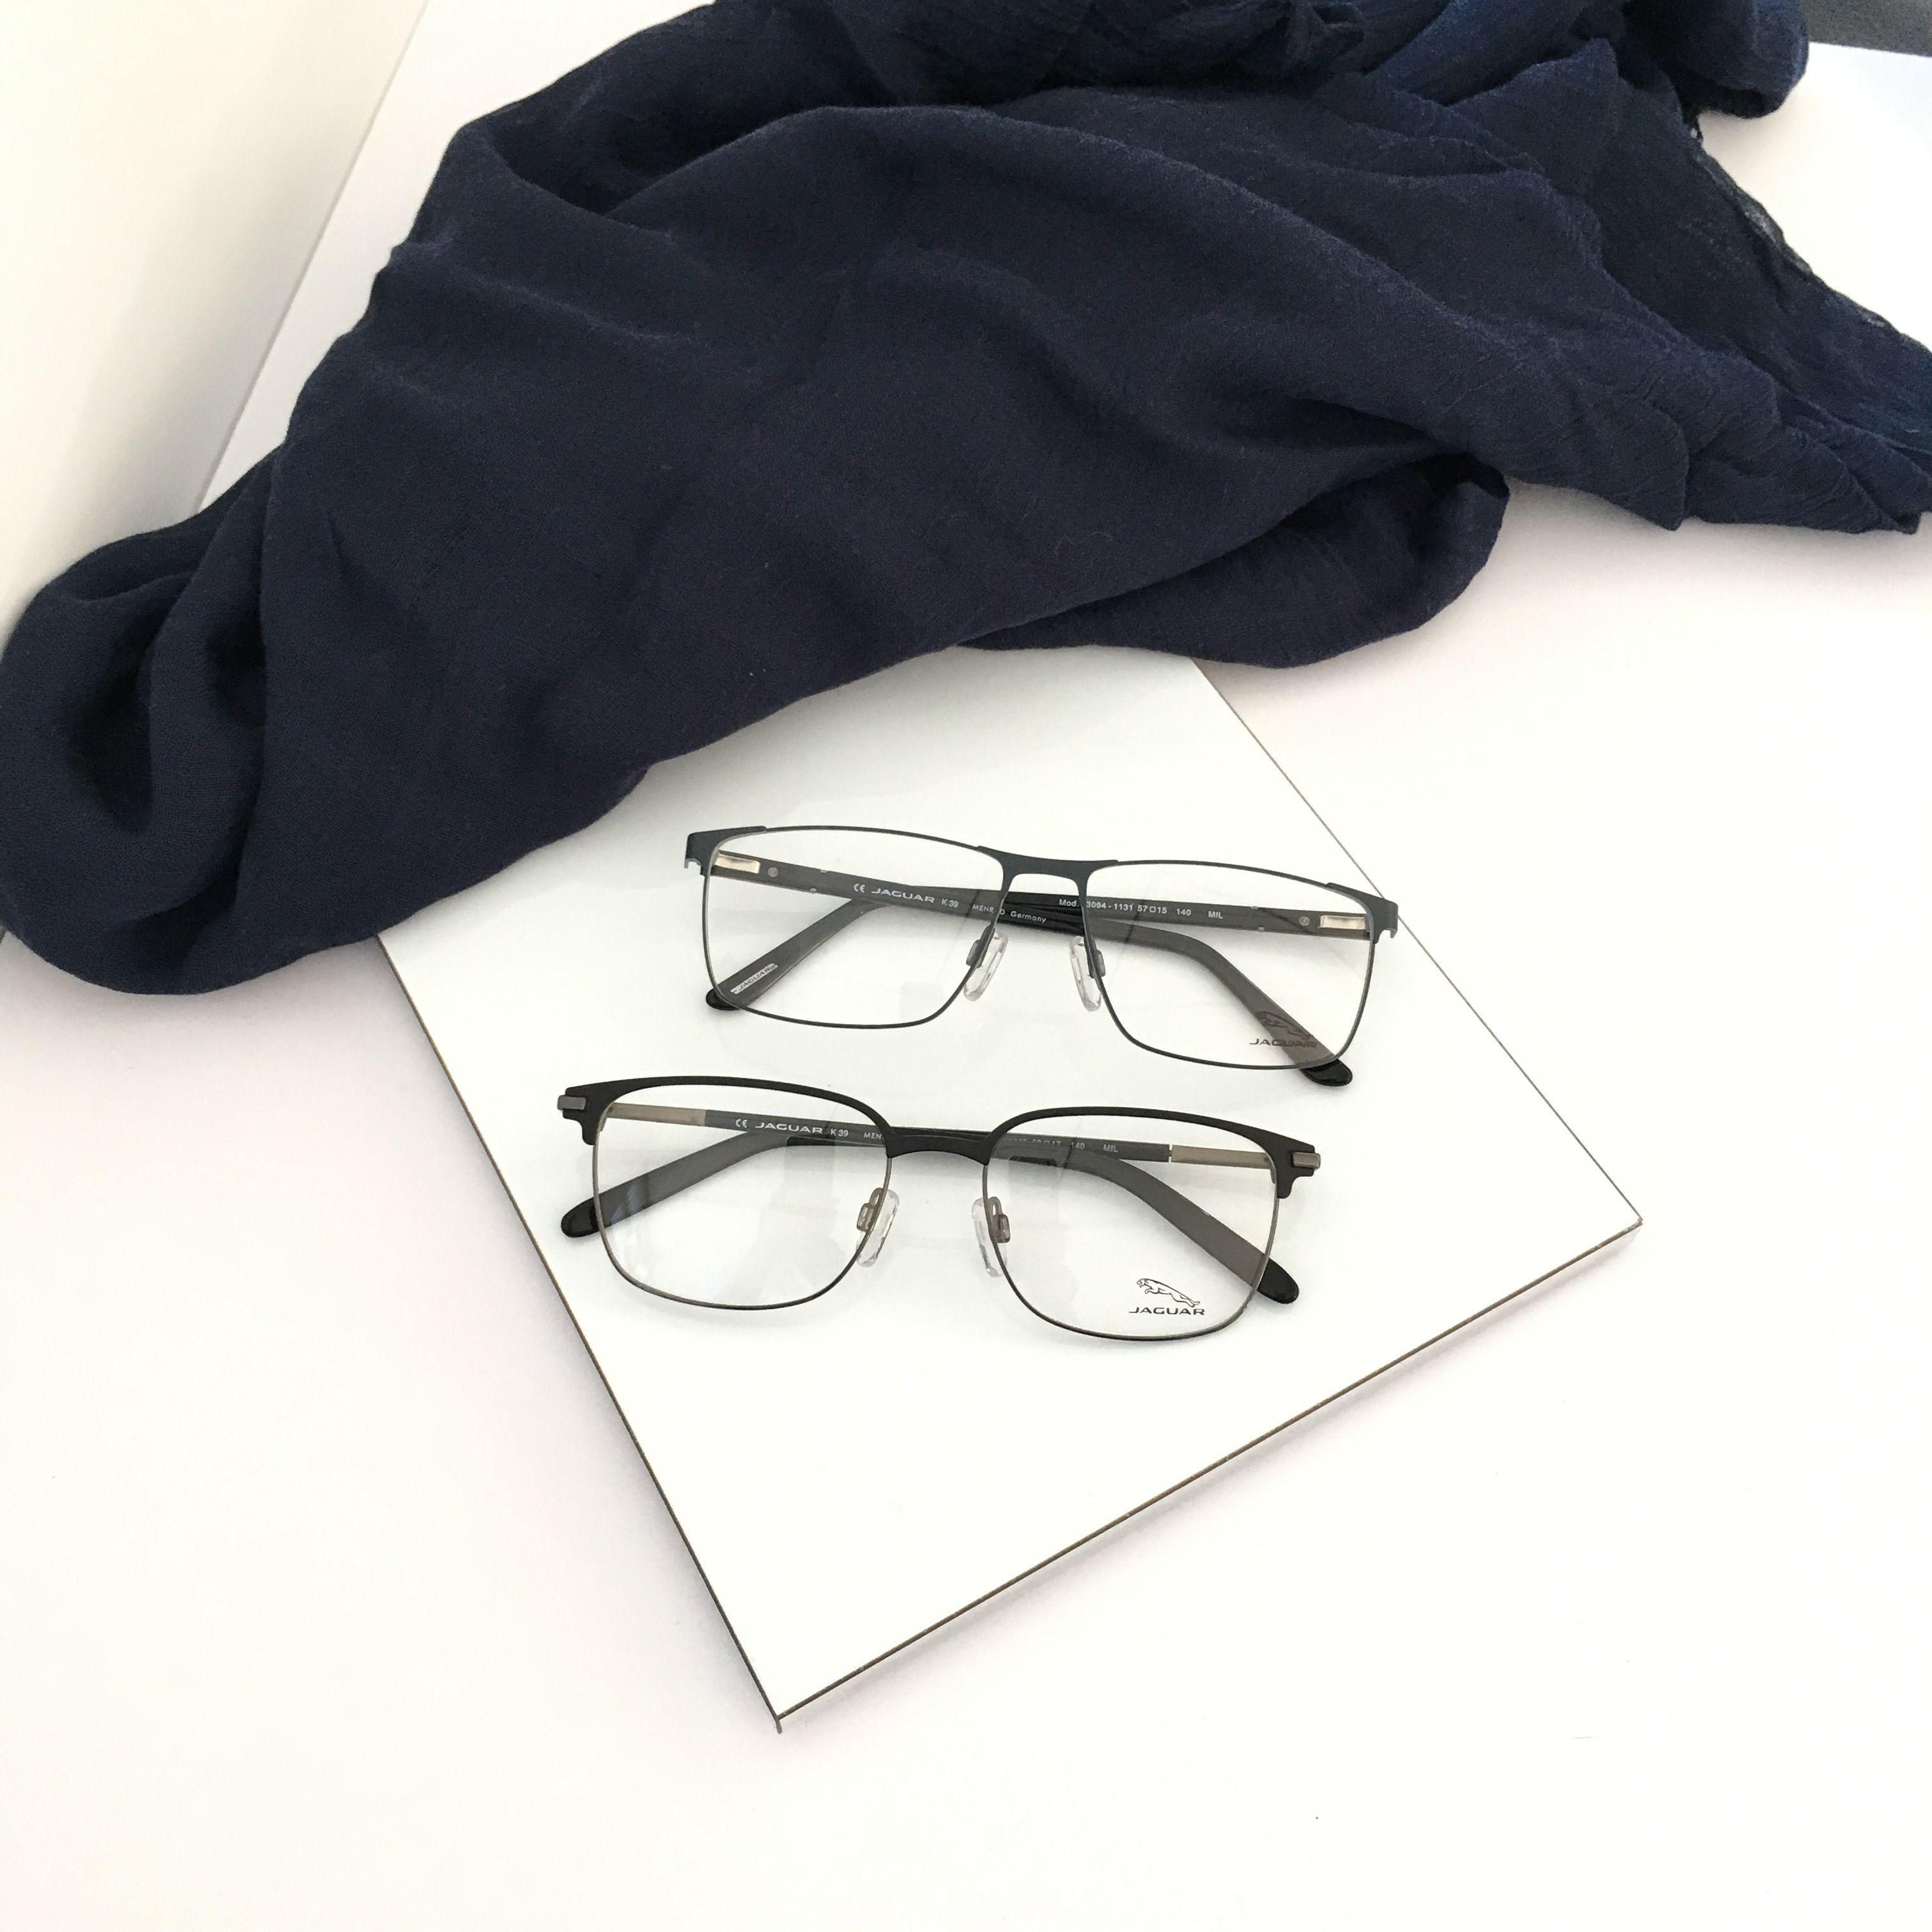 sunglasses fullxfull new il including case vintage col unworn listing eyewear deadstock jaguar